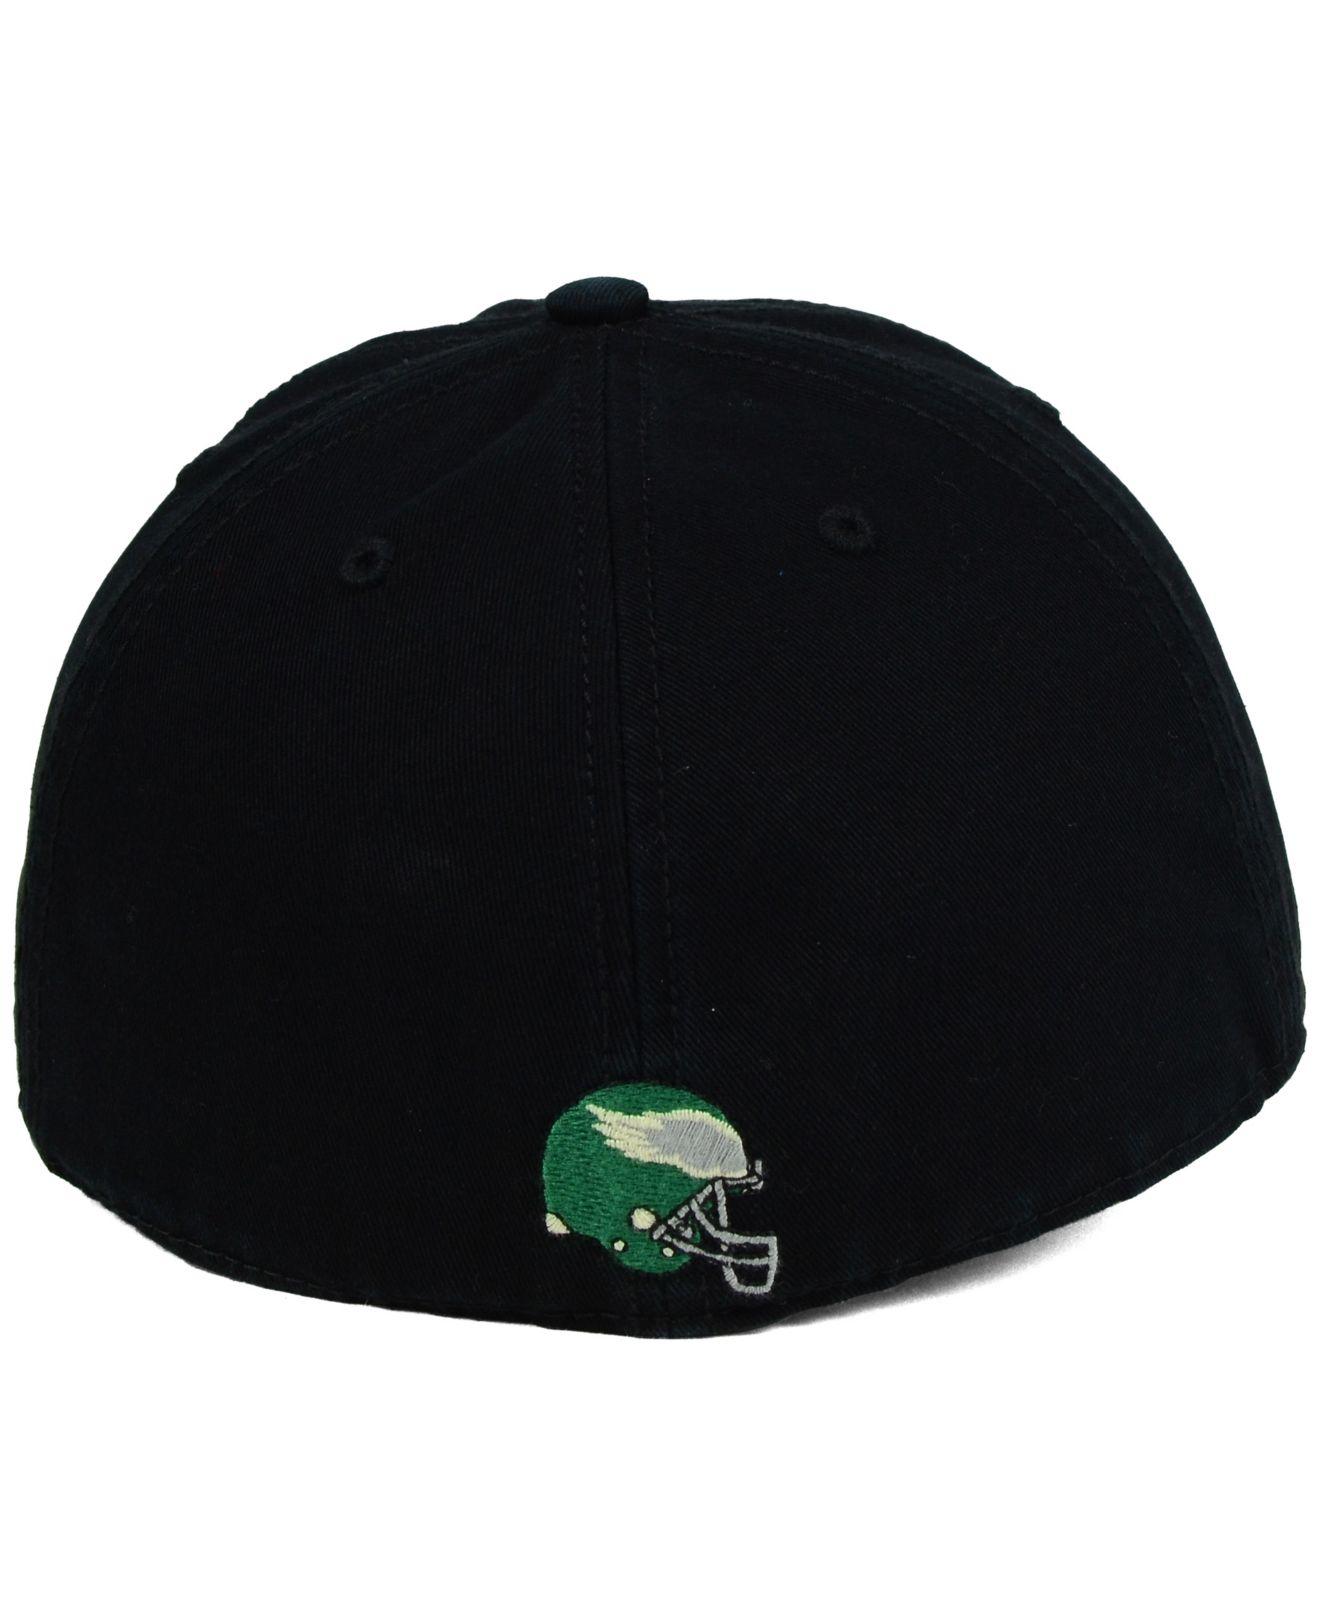 85d142cf9f3 ... real lyst 47 brand philadelphia eagles papa franchise cap in black for  men 6392e 88cac official philadelphia eagles adjustable ...